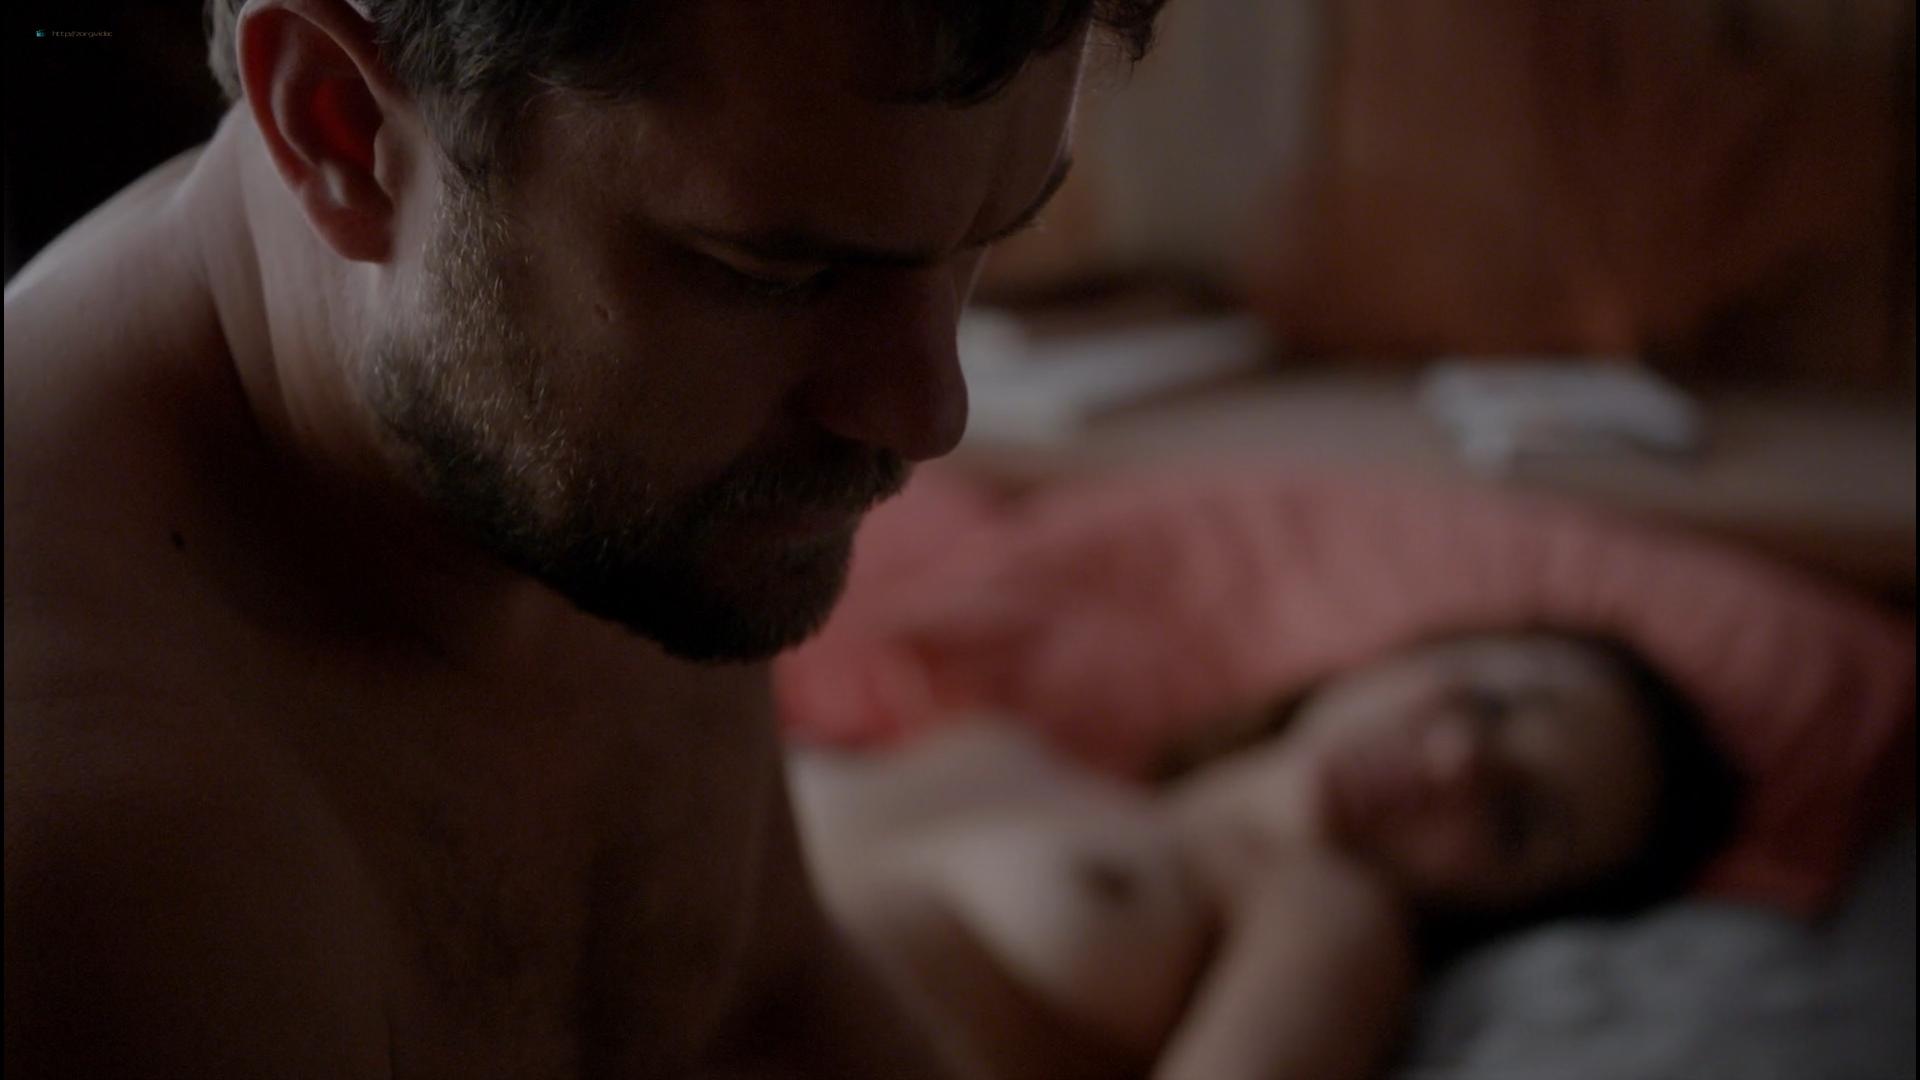 Catalina Sandino Moreno nude boobs and sex - The Affair (2015) S02E07 HD 1080p (1)